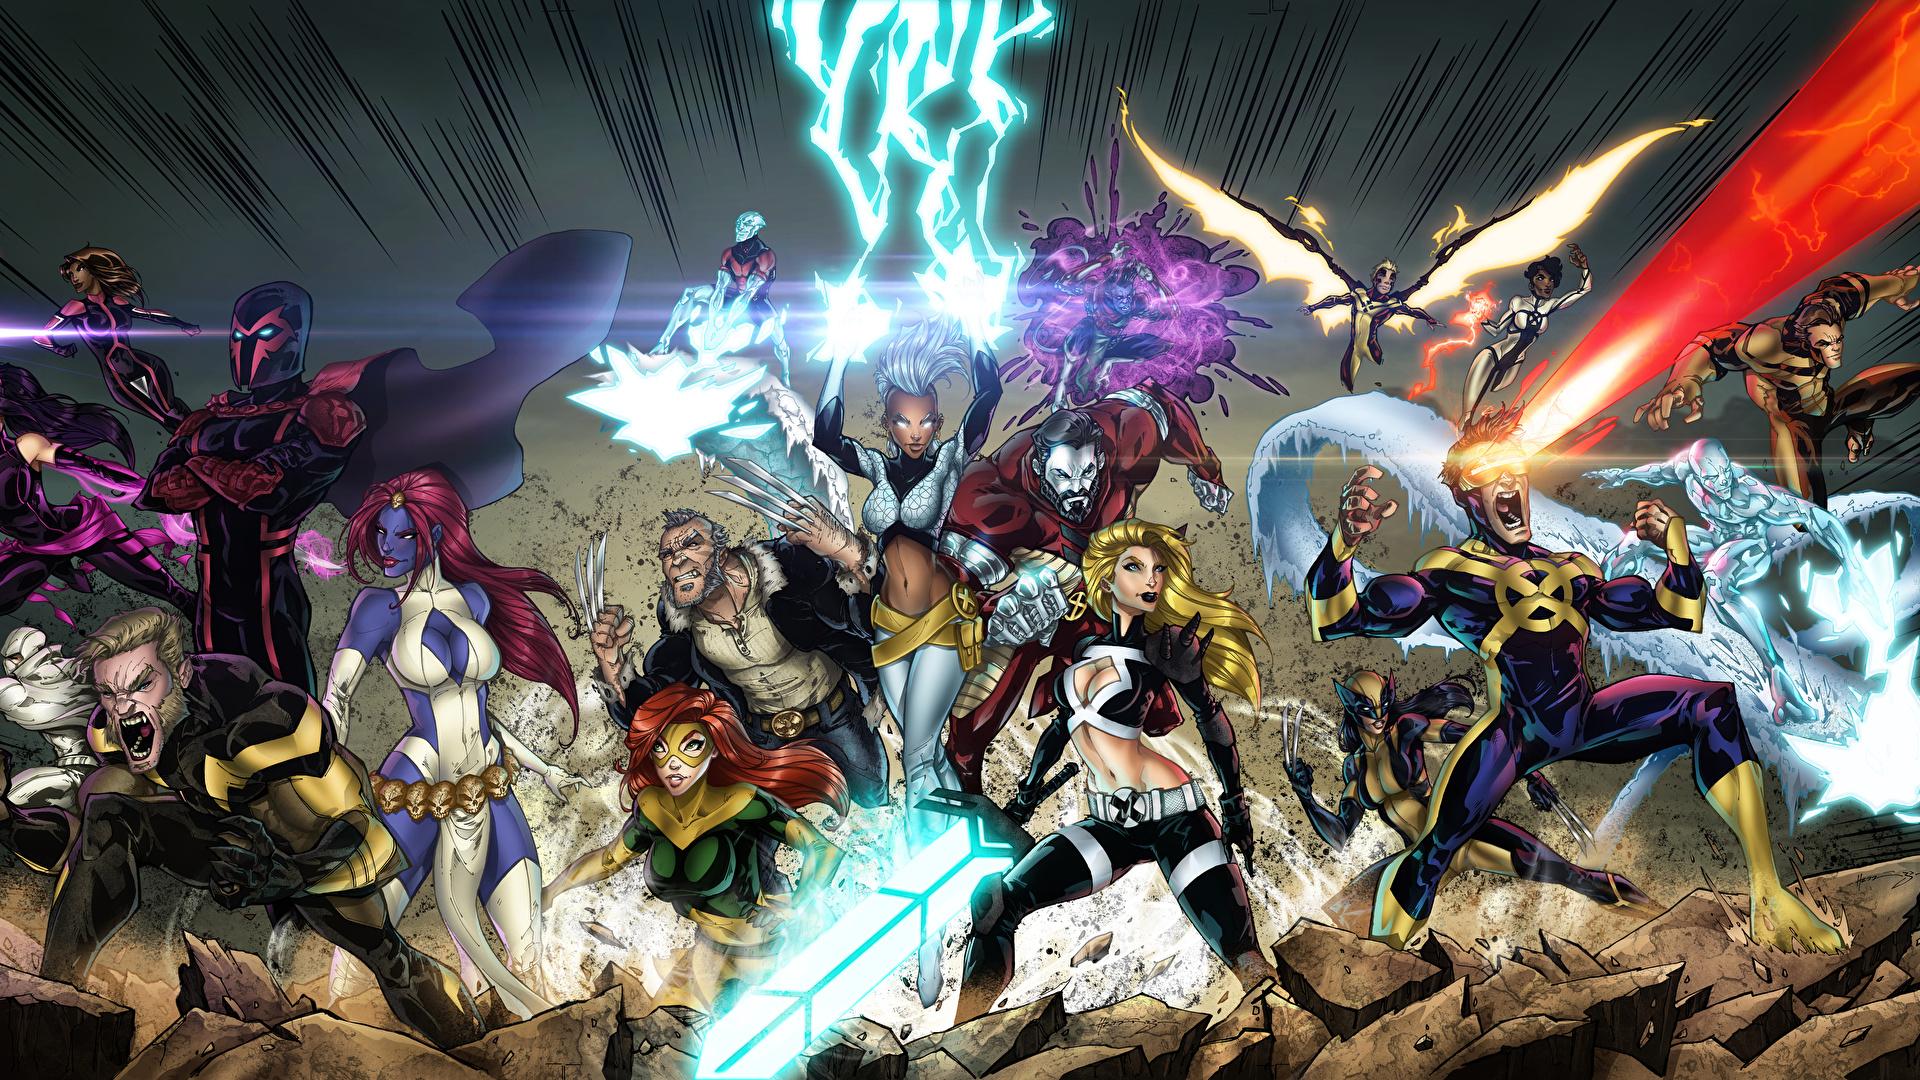 Photo Sorcery Heroes Comics X Men Fantasy 1920x1080